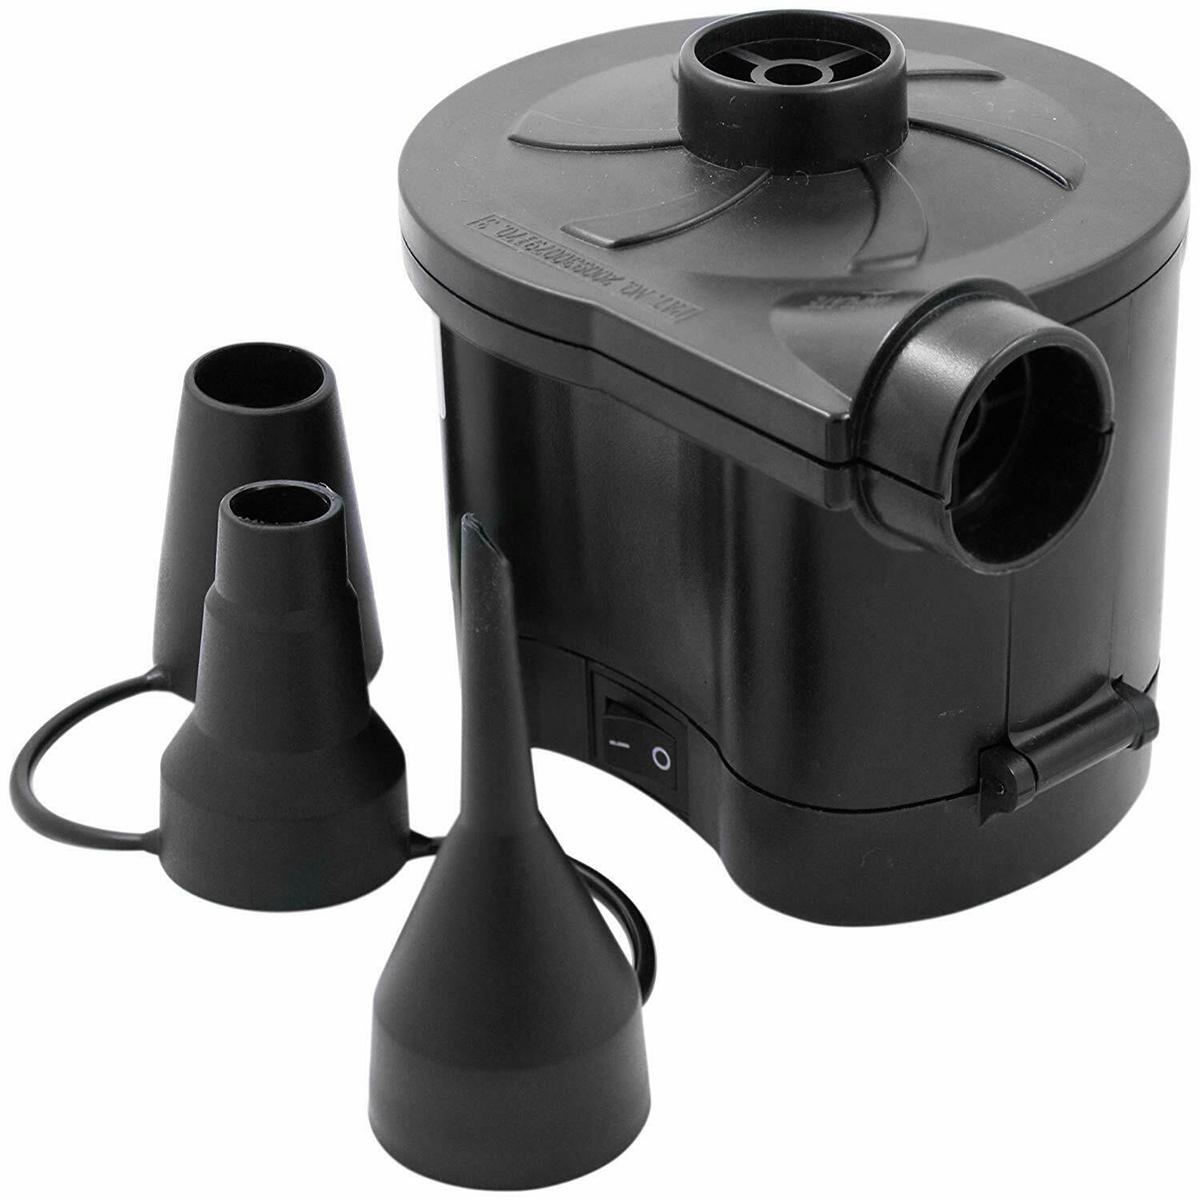 Coghlan's 4D Battery Air Pump, Cordless Portable ...